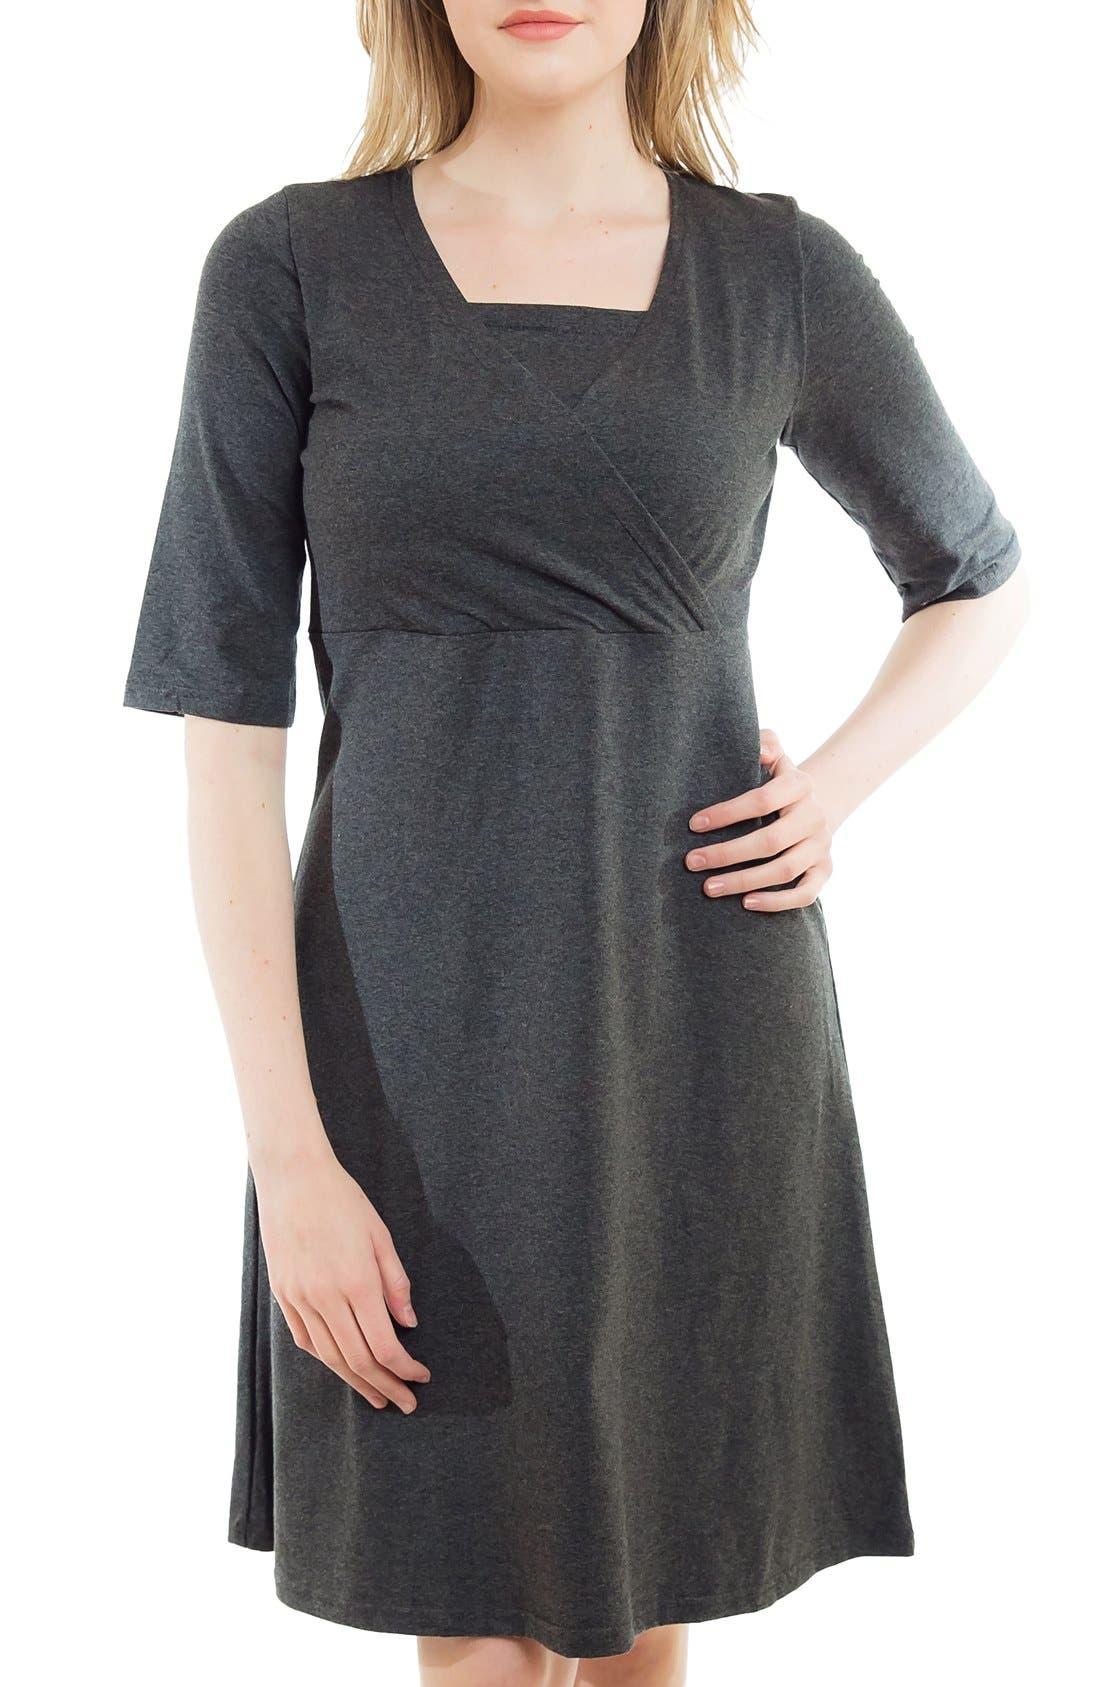 NURTURE-ELLE Crossover Maternity/Nursing Dress